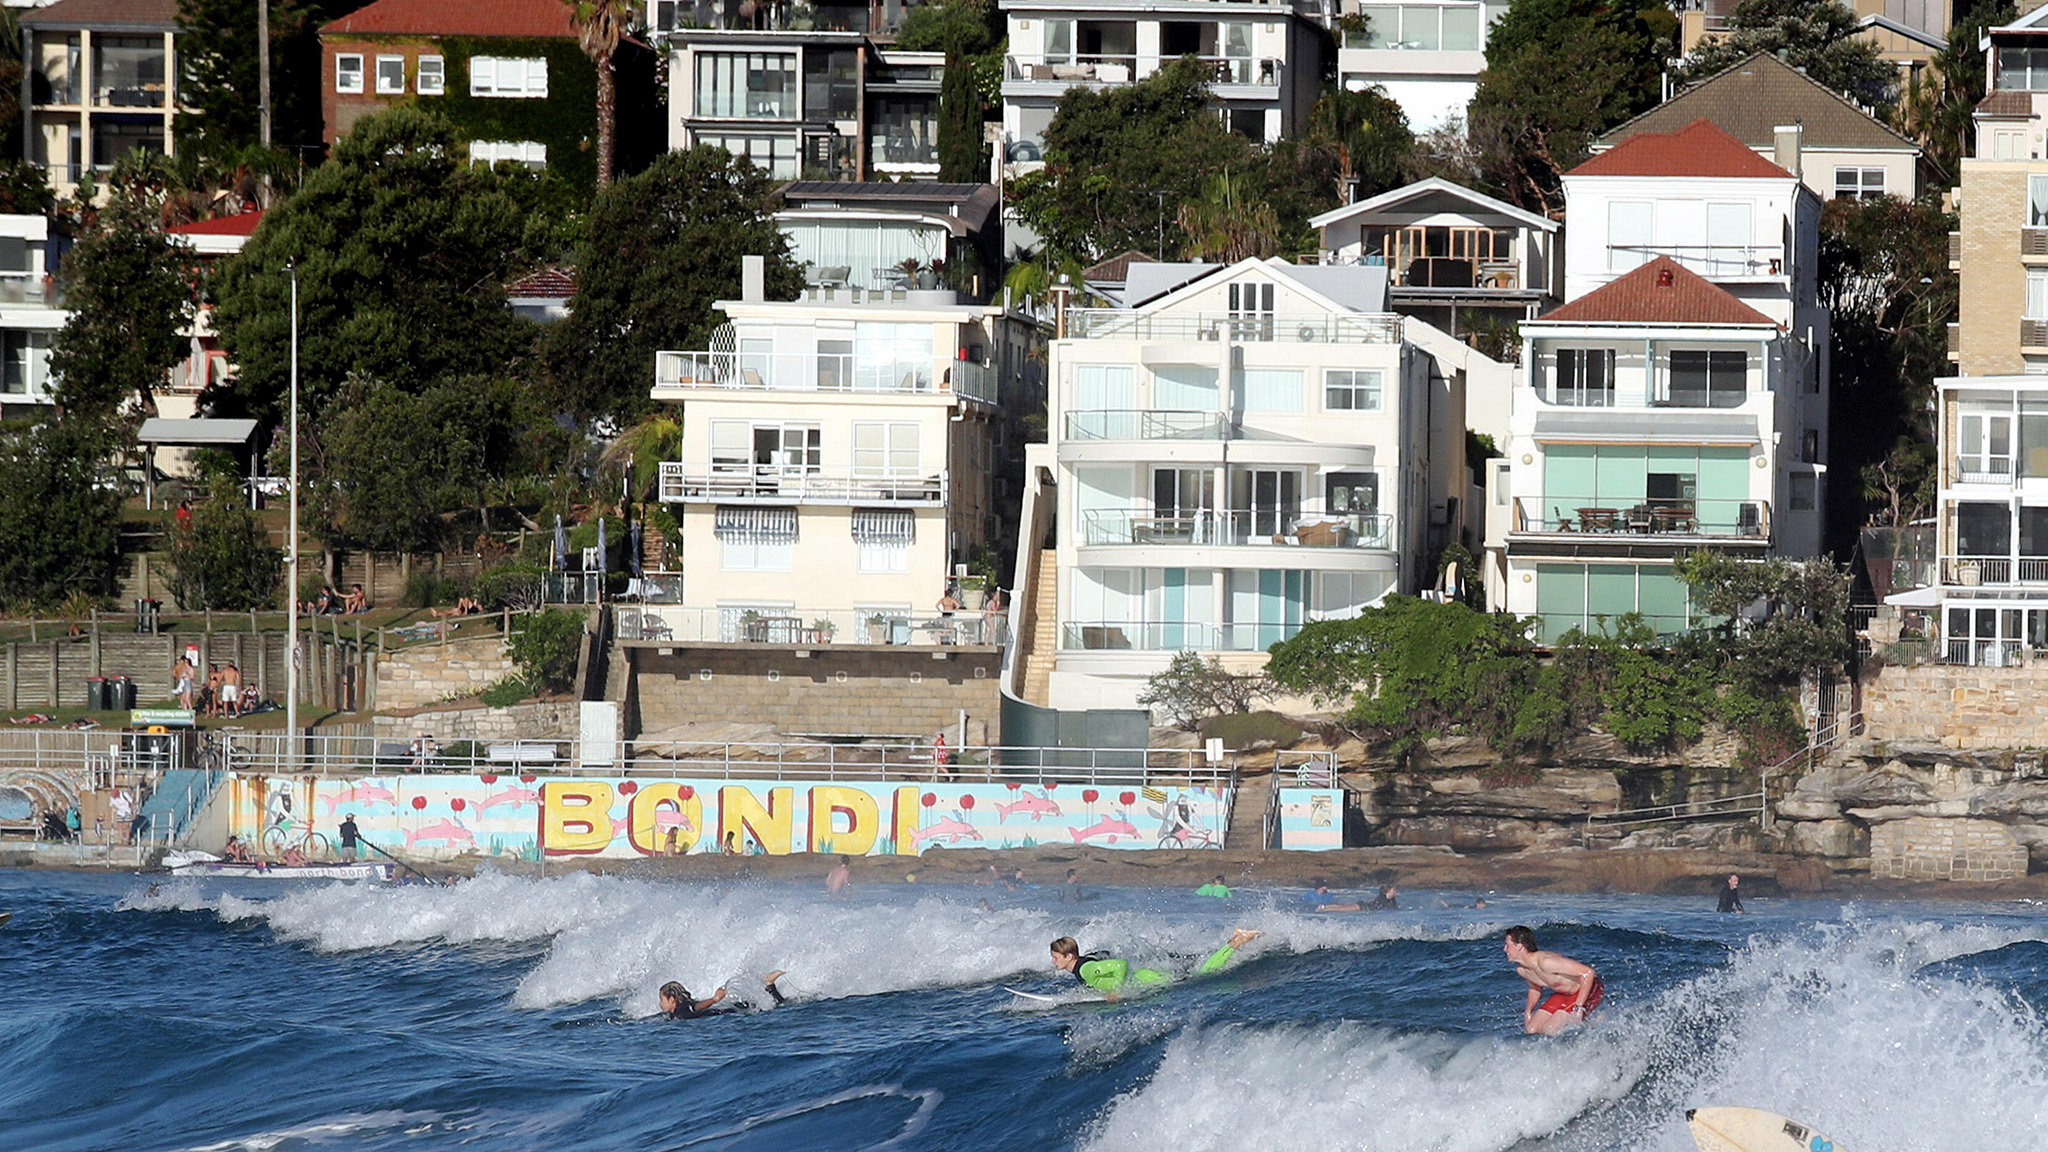 Sydney surf